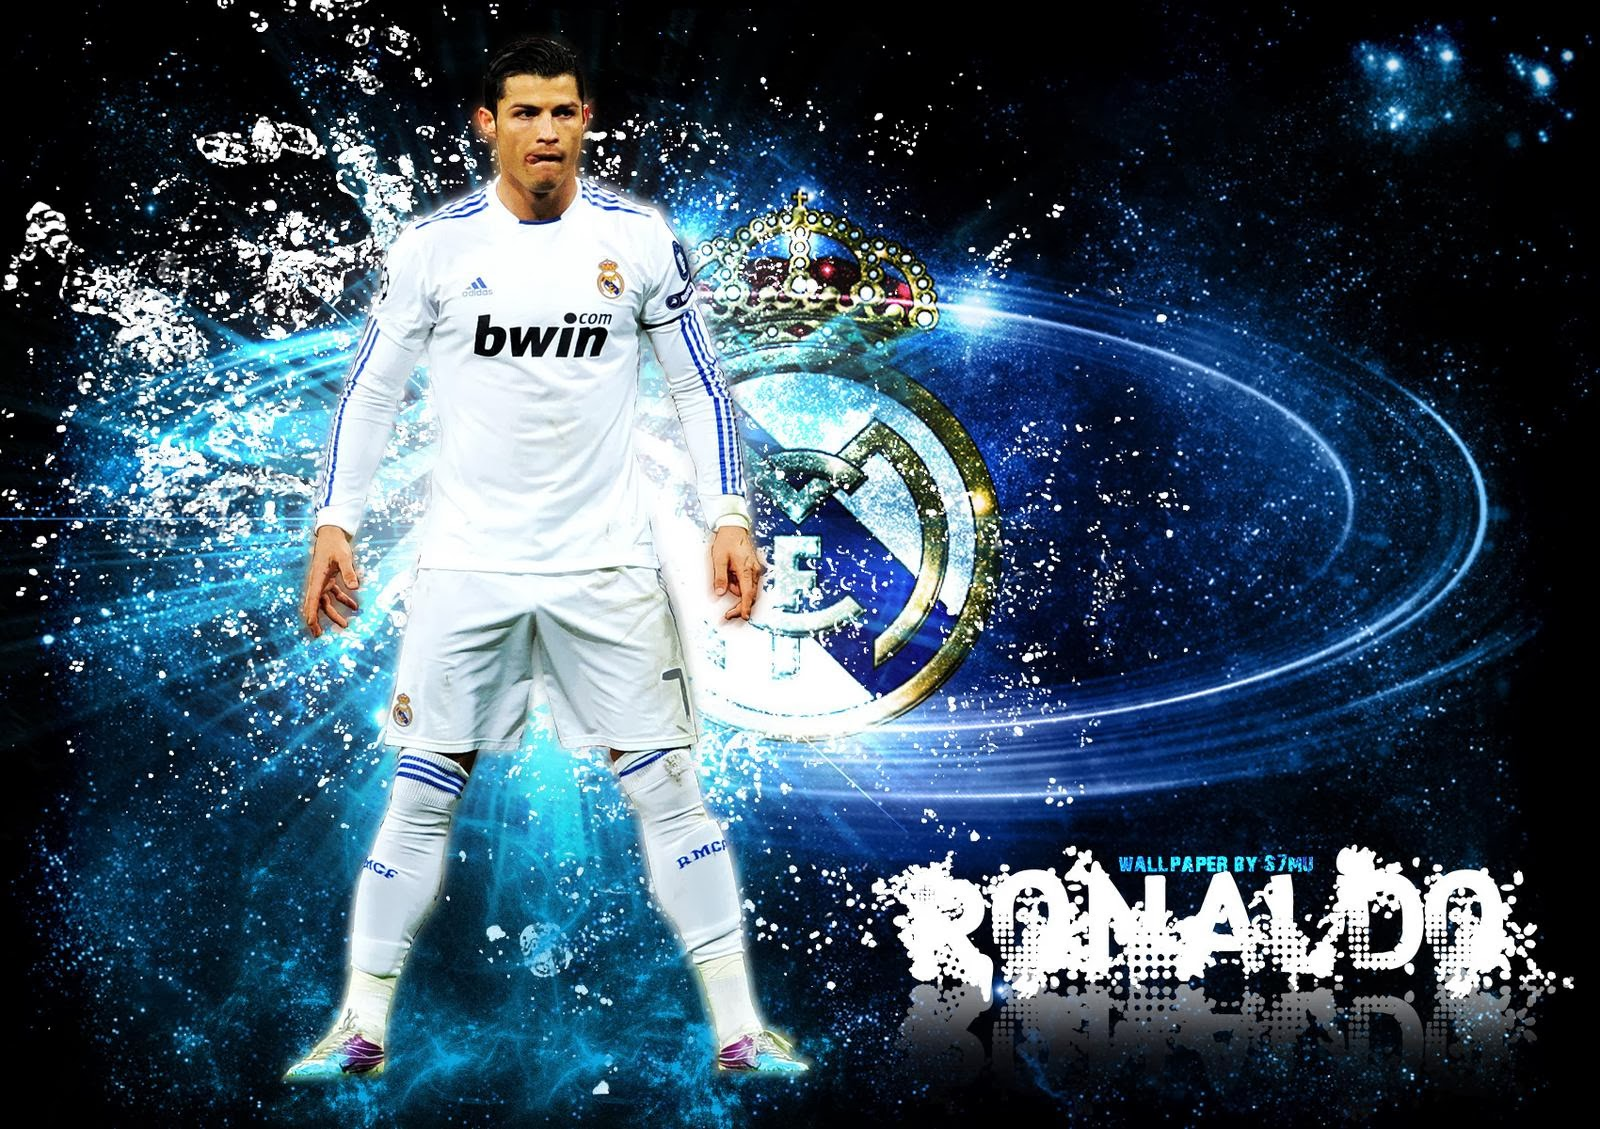 Cristiano Ronaldo Real Madrid HD Wallpaper 1600x1129